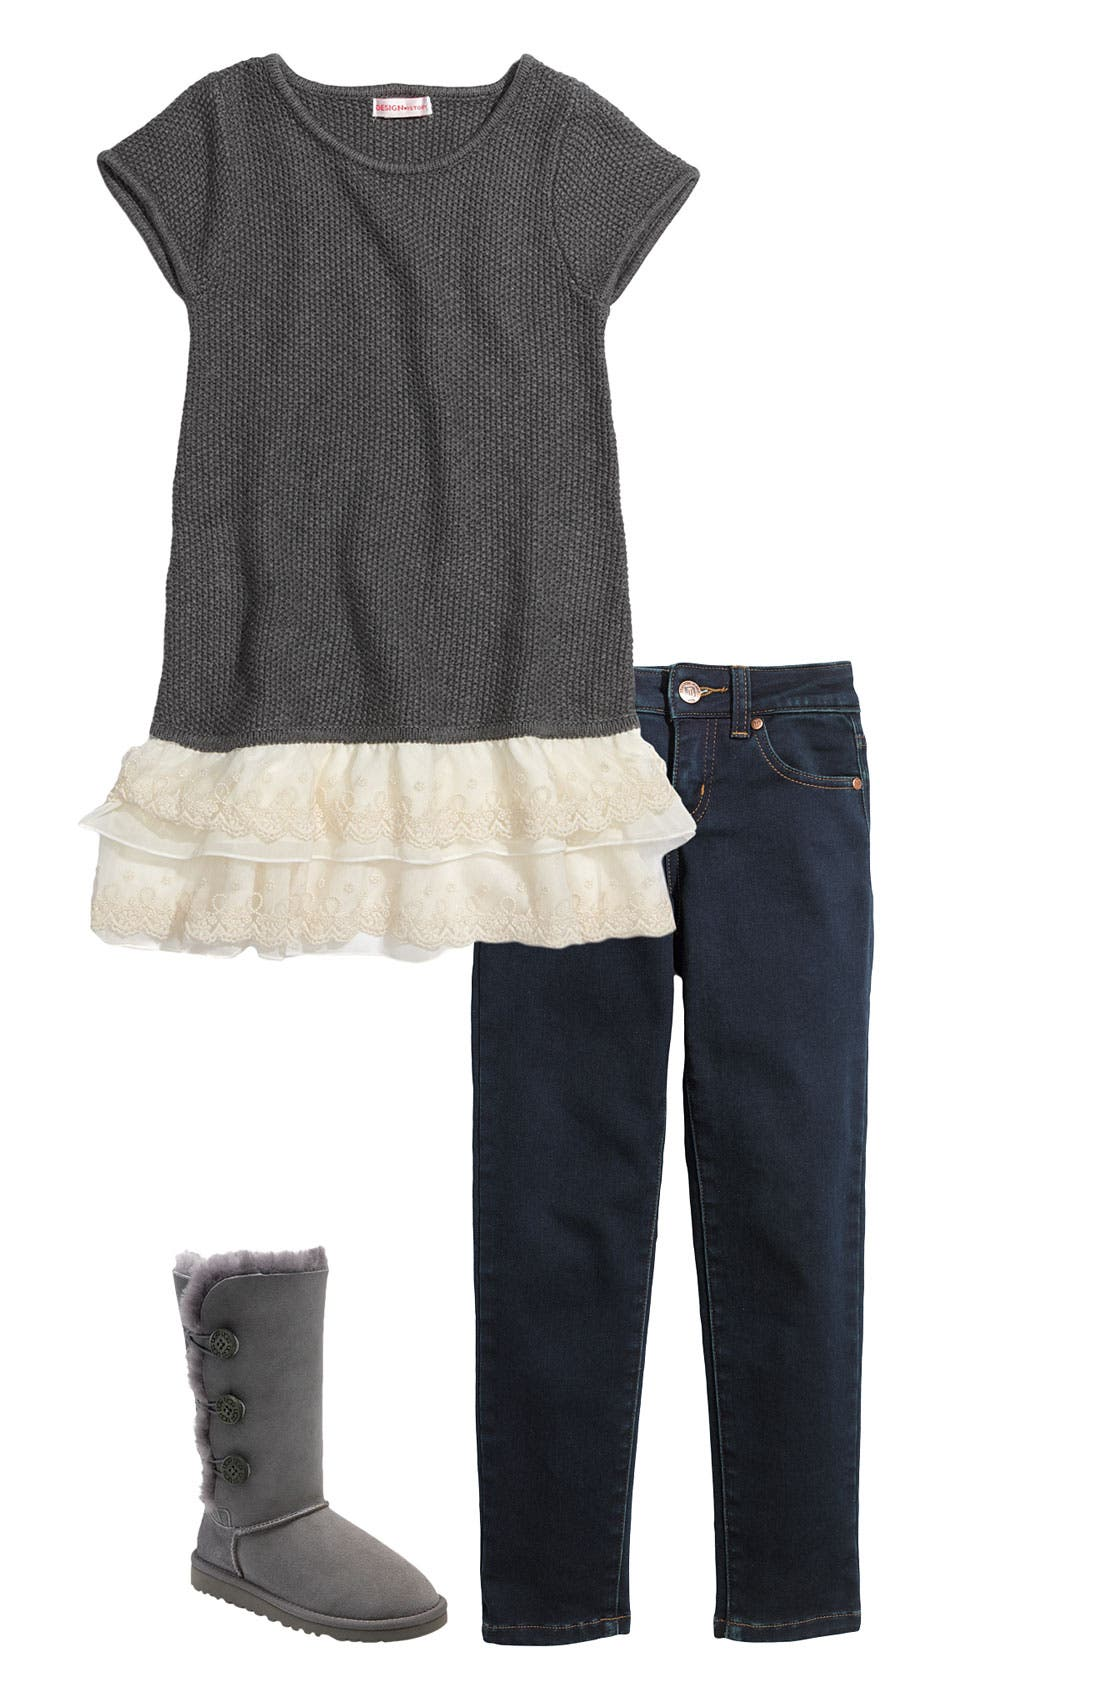 Main Image - Design History Sweater Dress & Tractor Leggings (Little Girls)